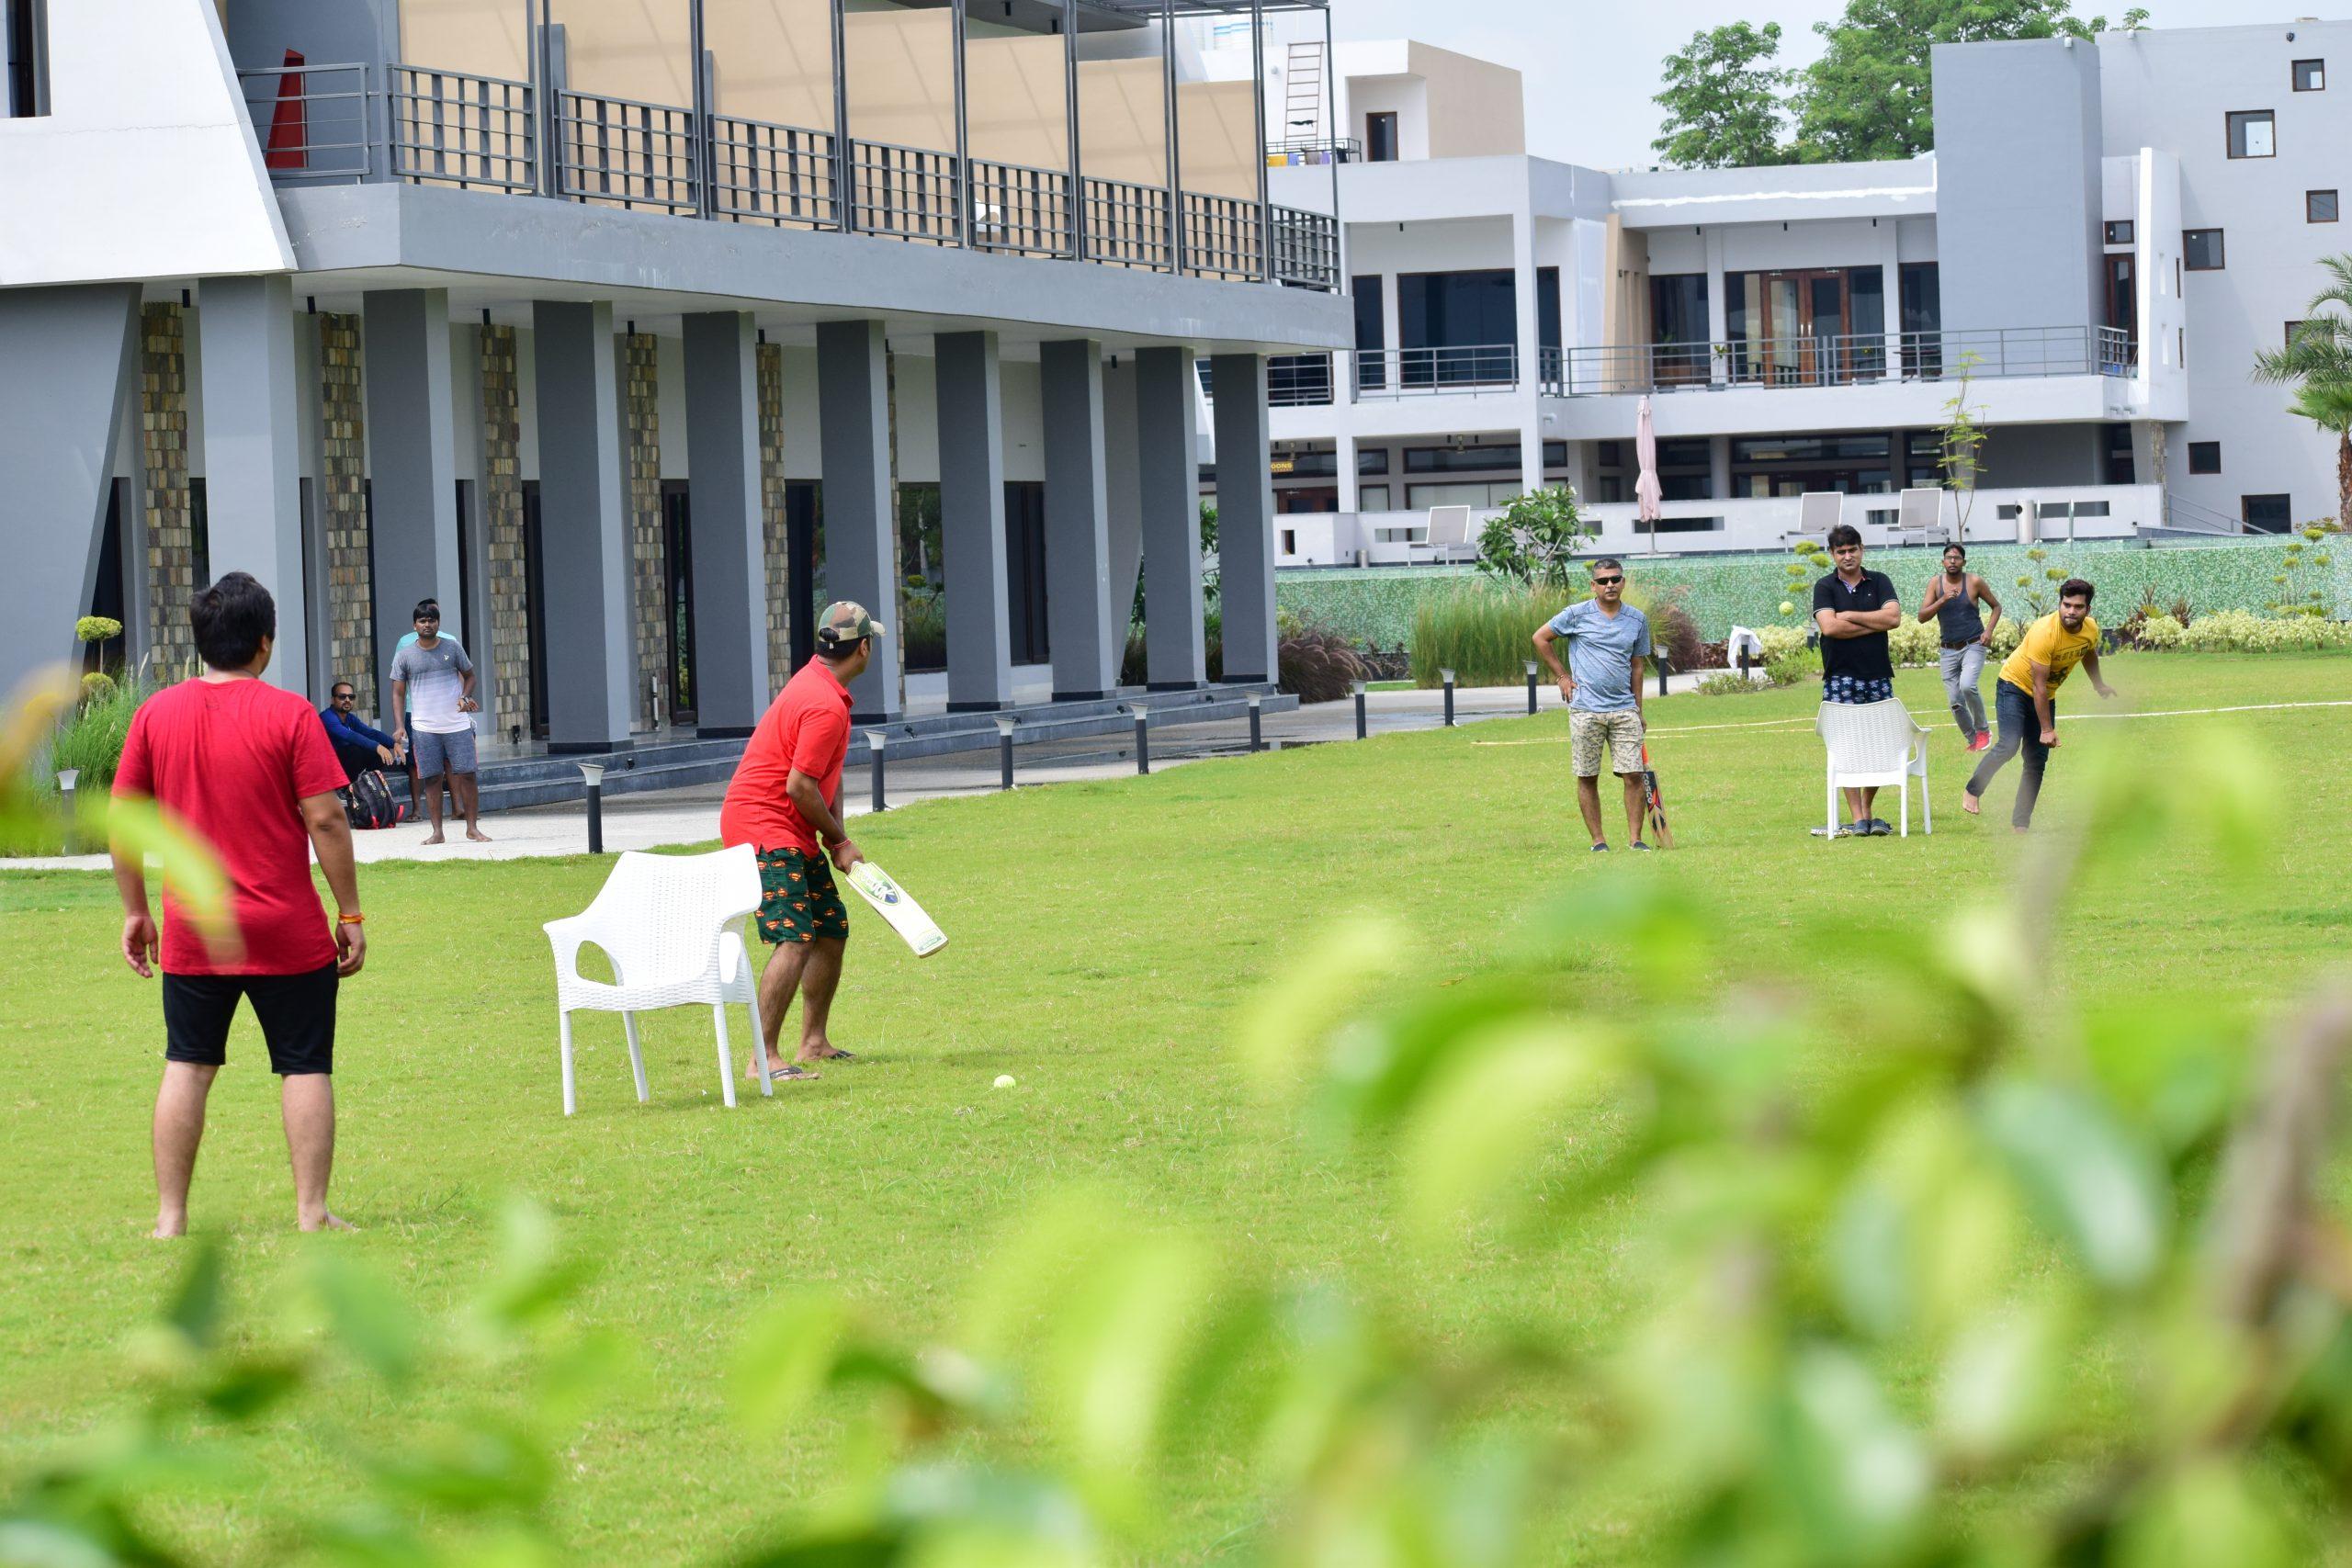 Boys playing cricket on lawn